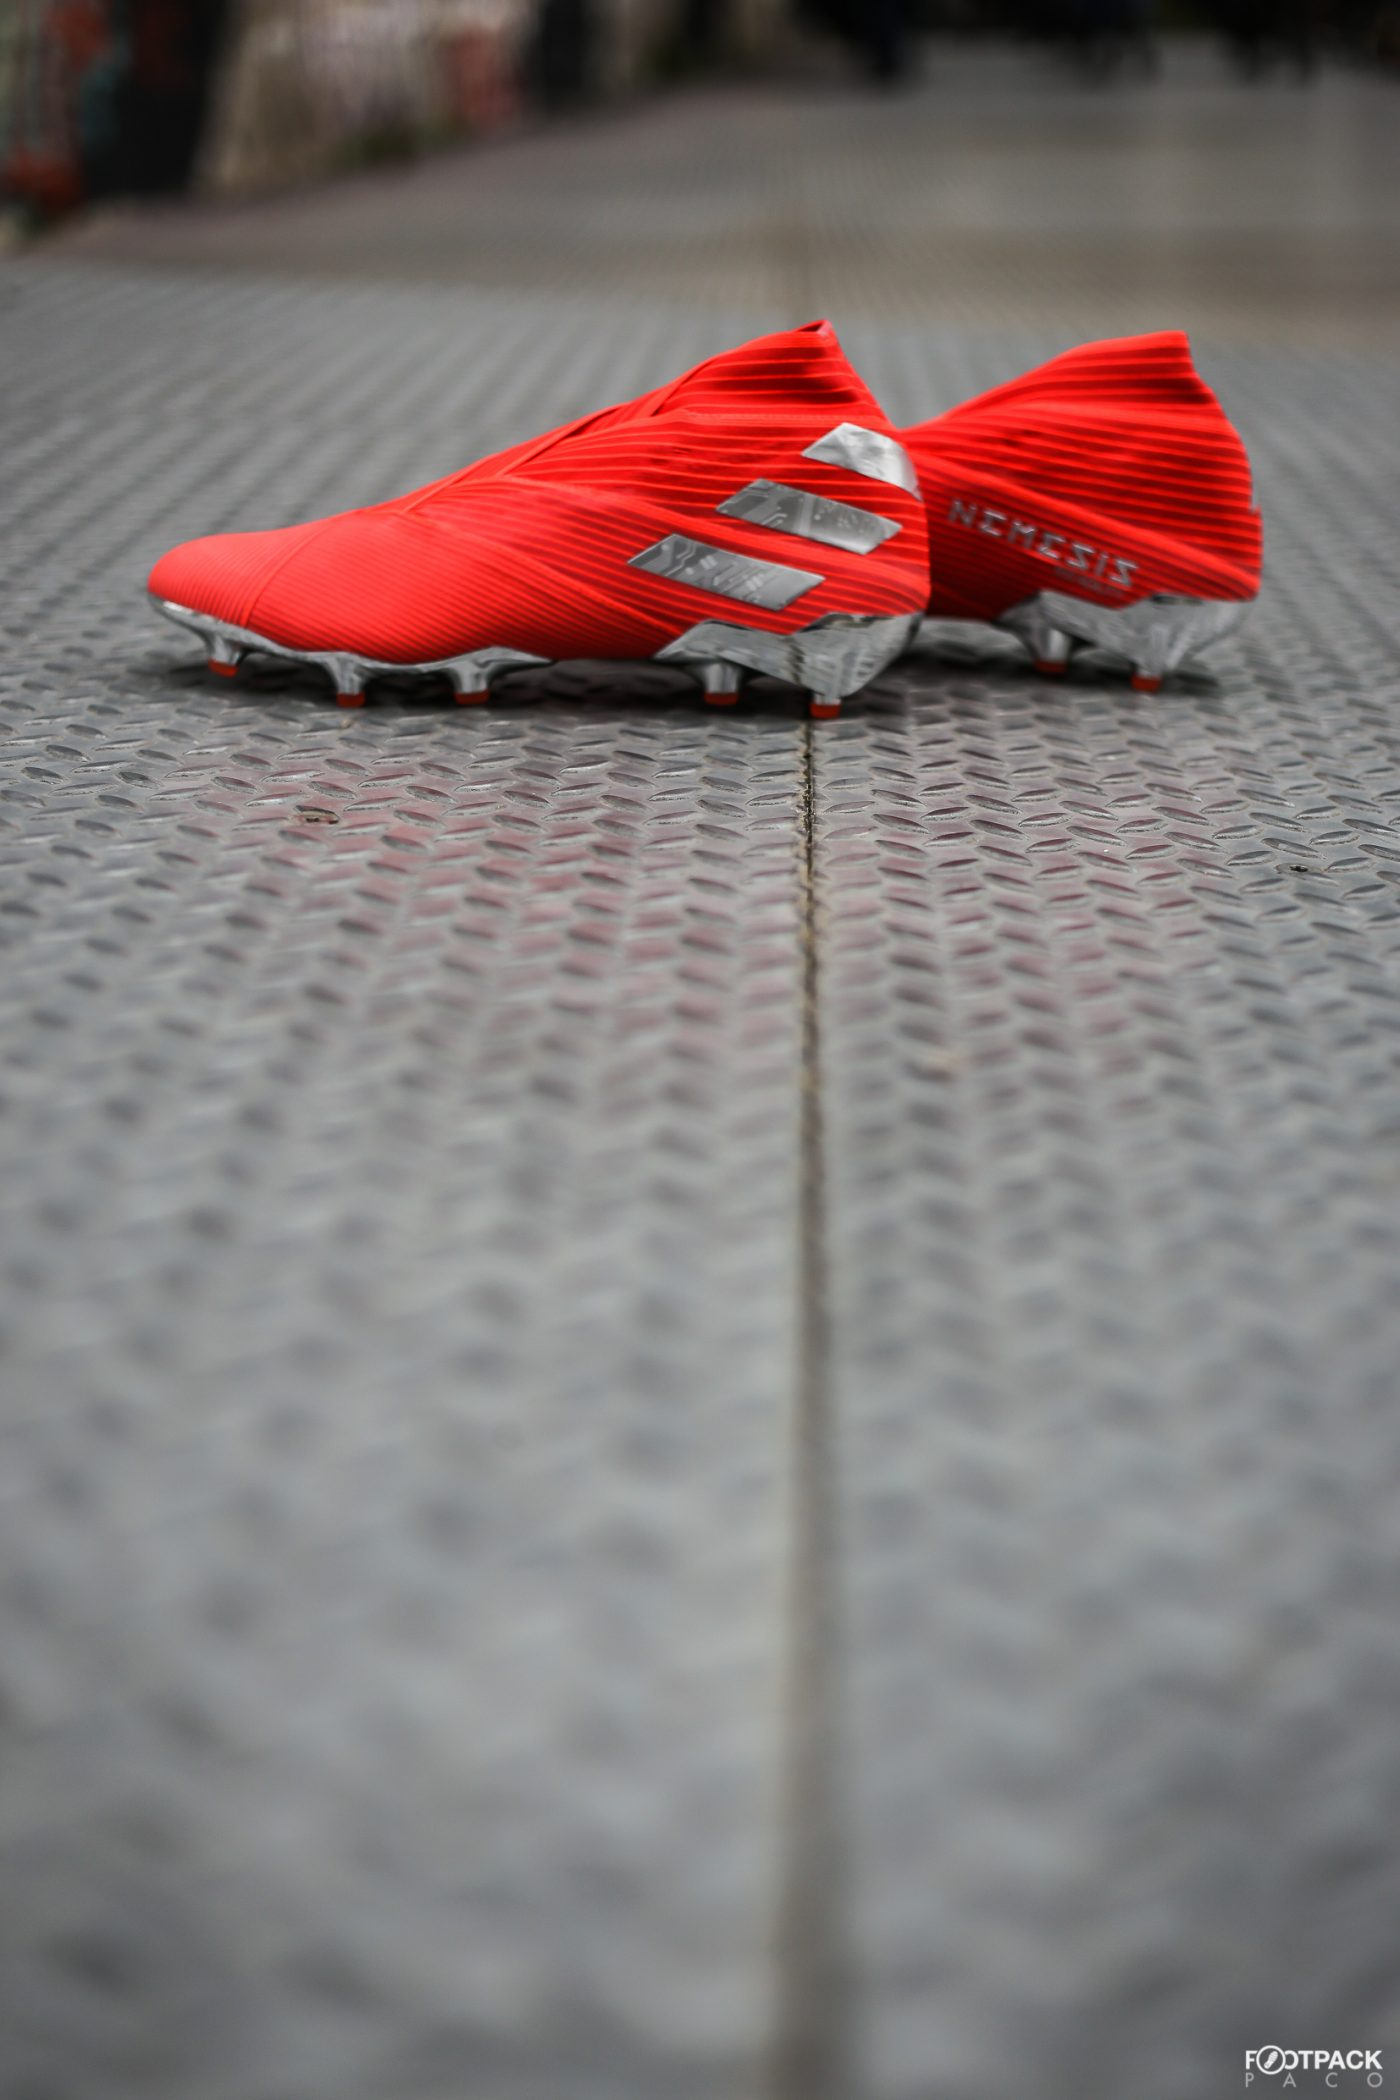 adidas-nemeziz-19-nemeziz19+-mai-2019-footpack-5